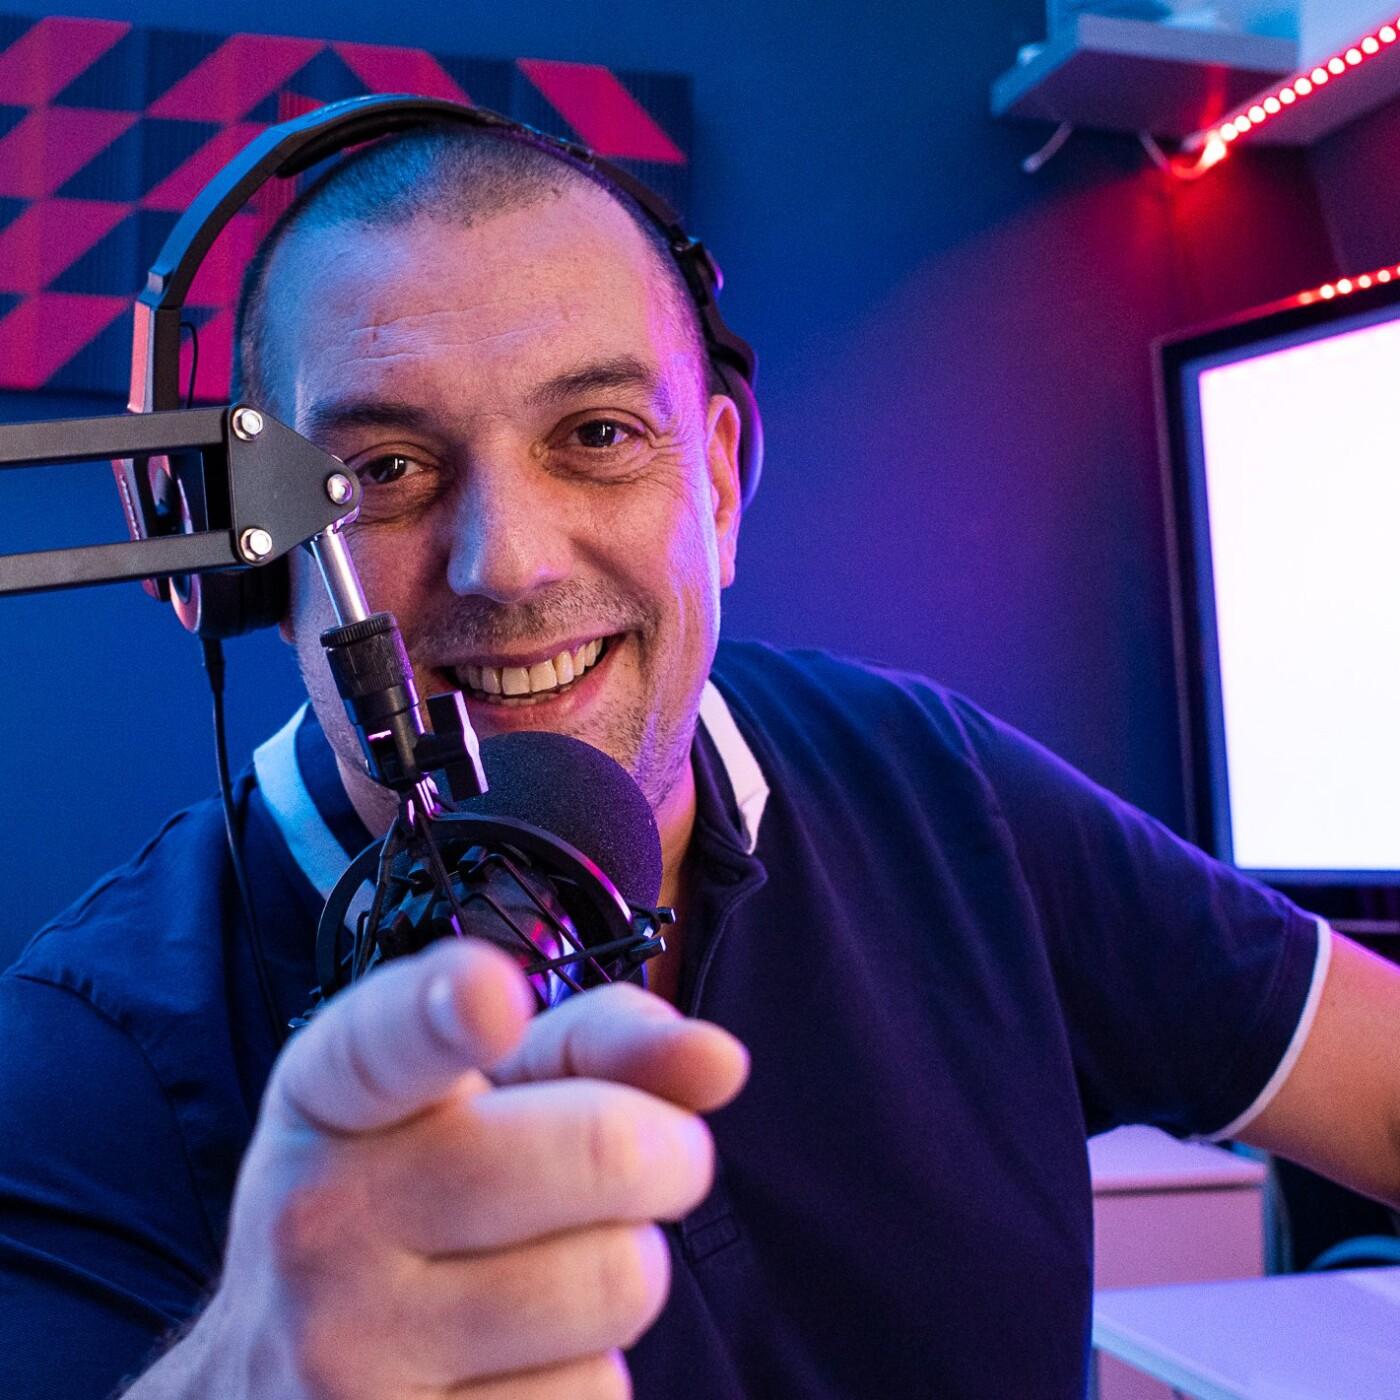 Gauthier & 200ème émission - StereoChic Radio